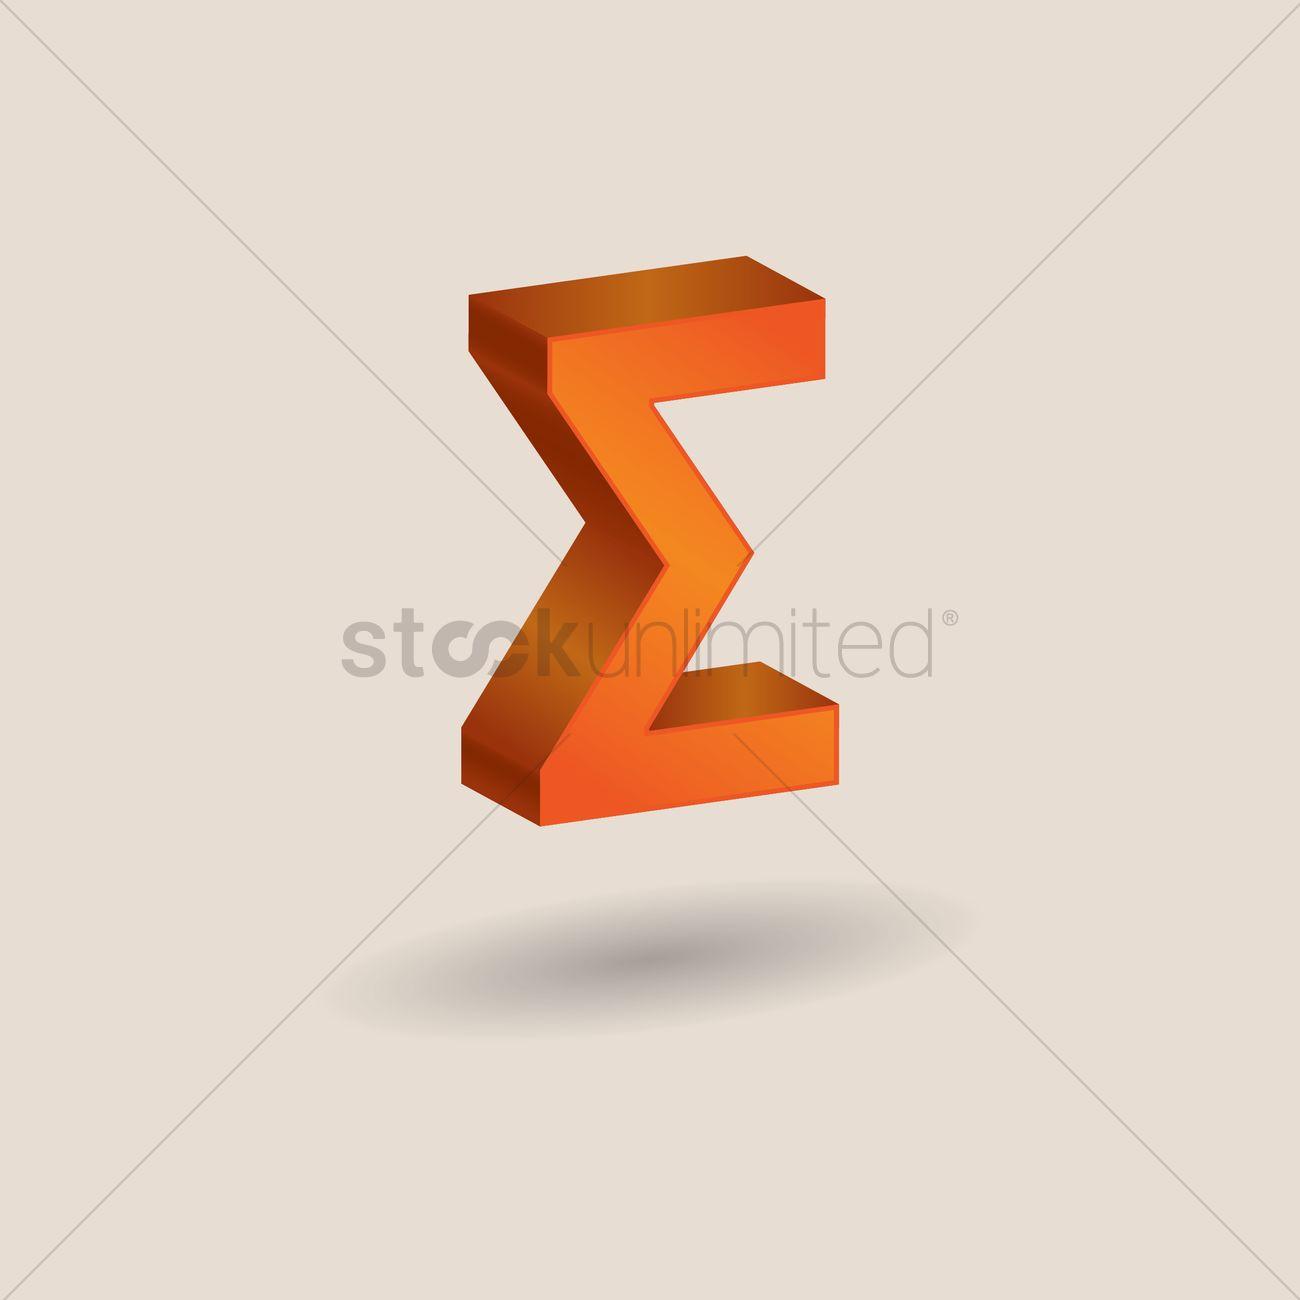 Sigma Symbol Vector Image 1608237 Stockunlimited